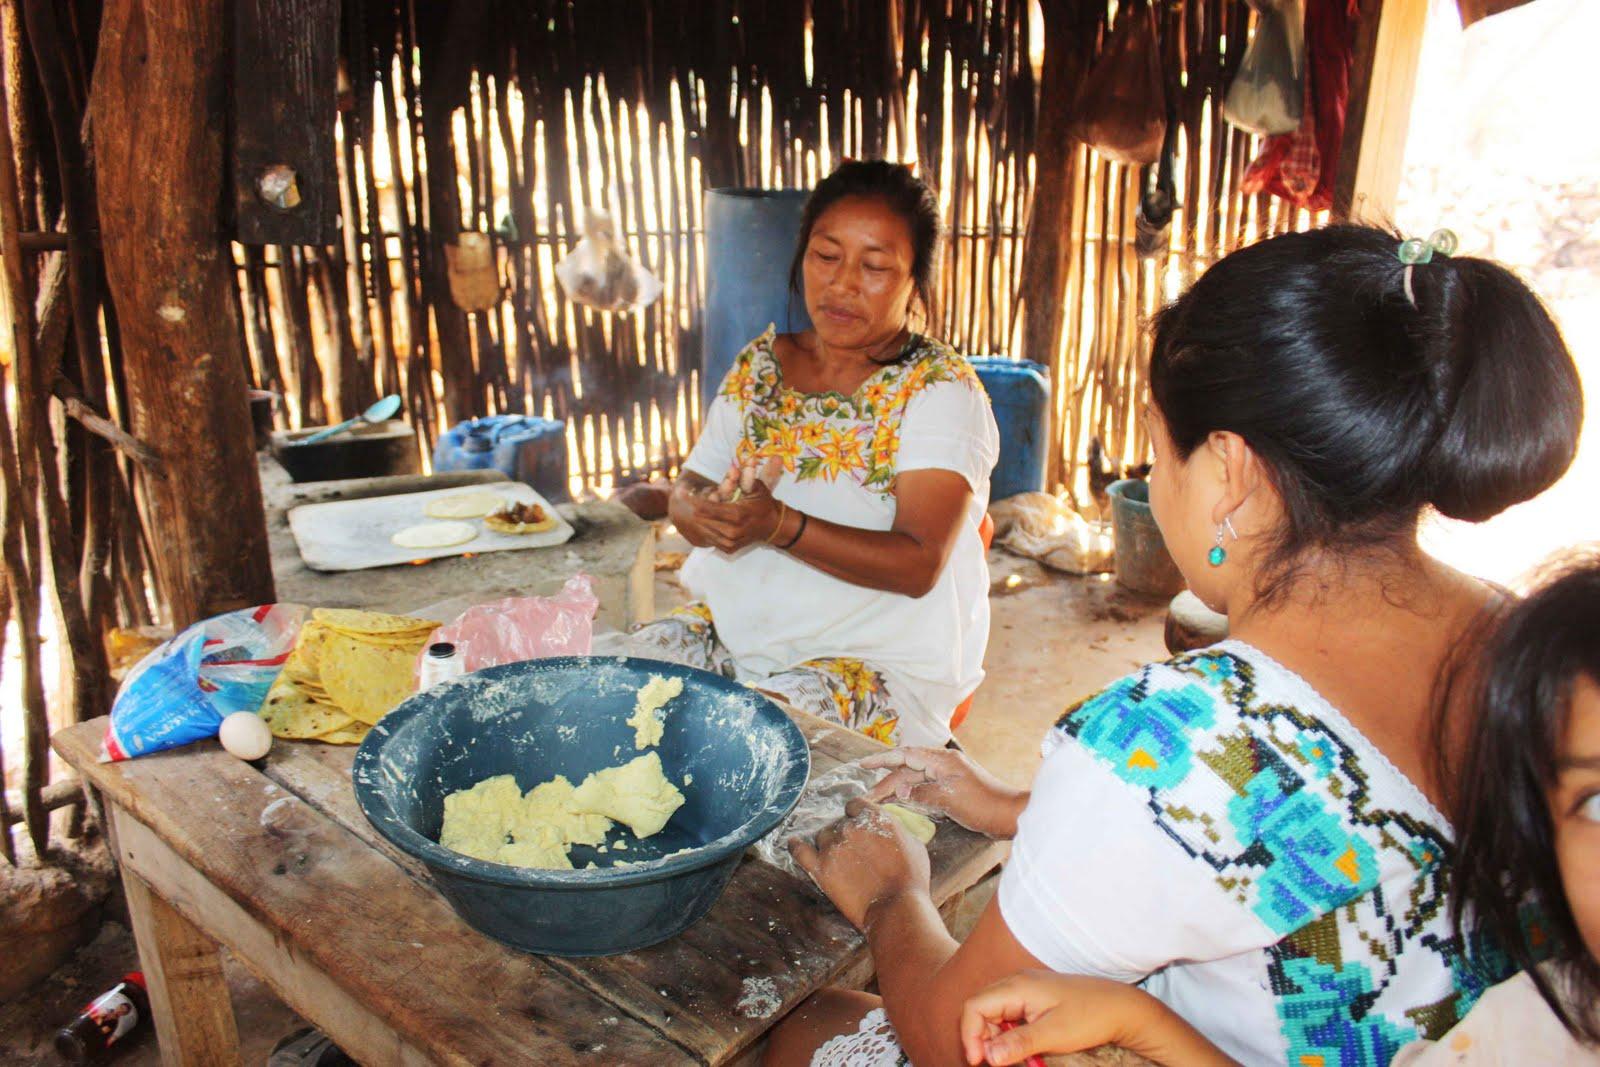 Abuela brasileira de nuevo - 3 6